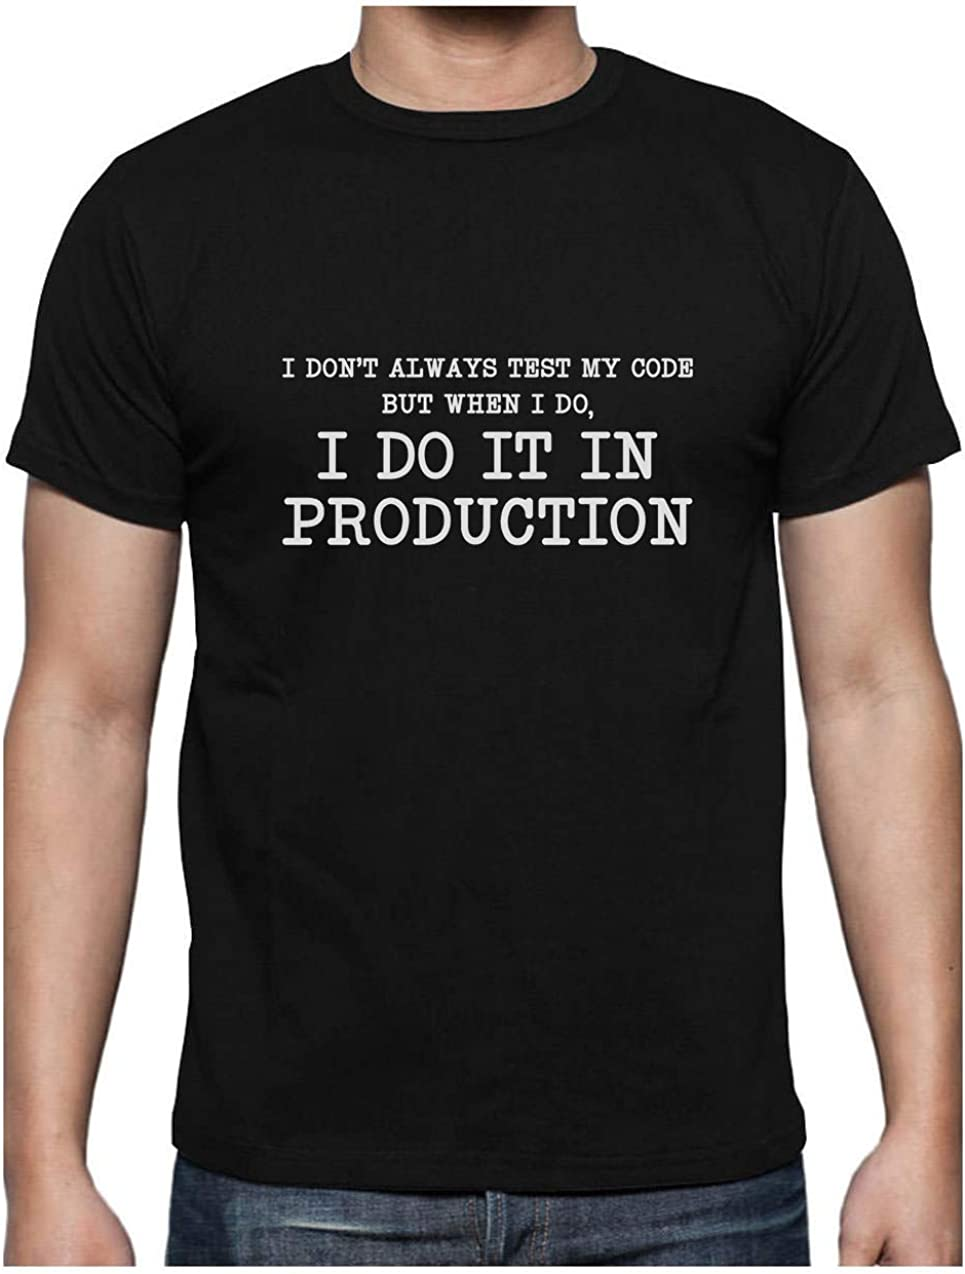 Green Turtle T-Shirts Camiseta para Hombre- Regalos para Ingenieros - I Don't Always Test My Code -